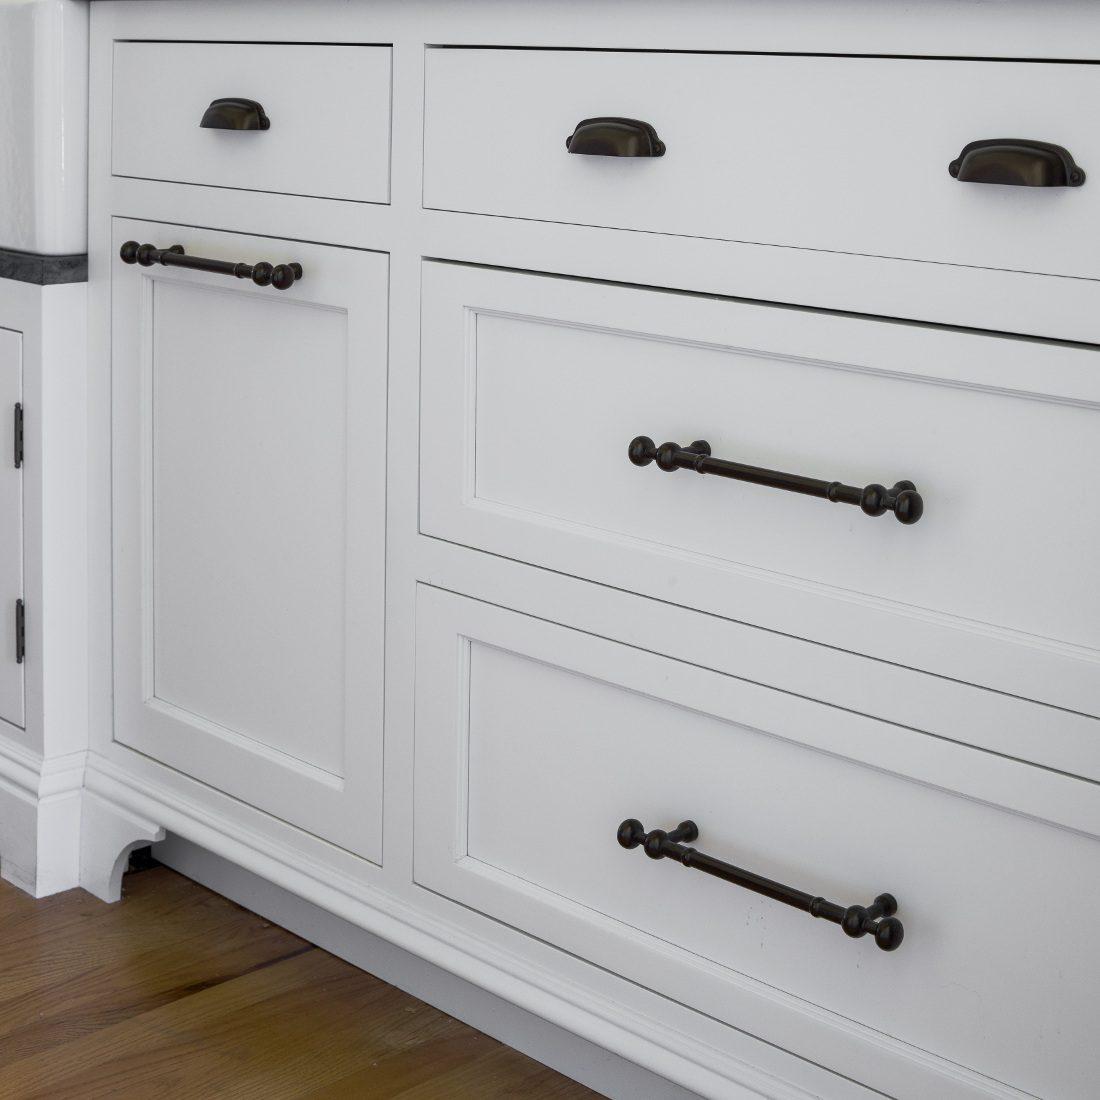 San Jose Kitchen Cabinets: Kitchen Cabinets 101 - Ideas To Choose Design